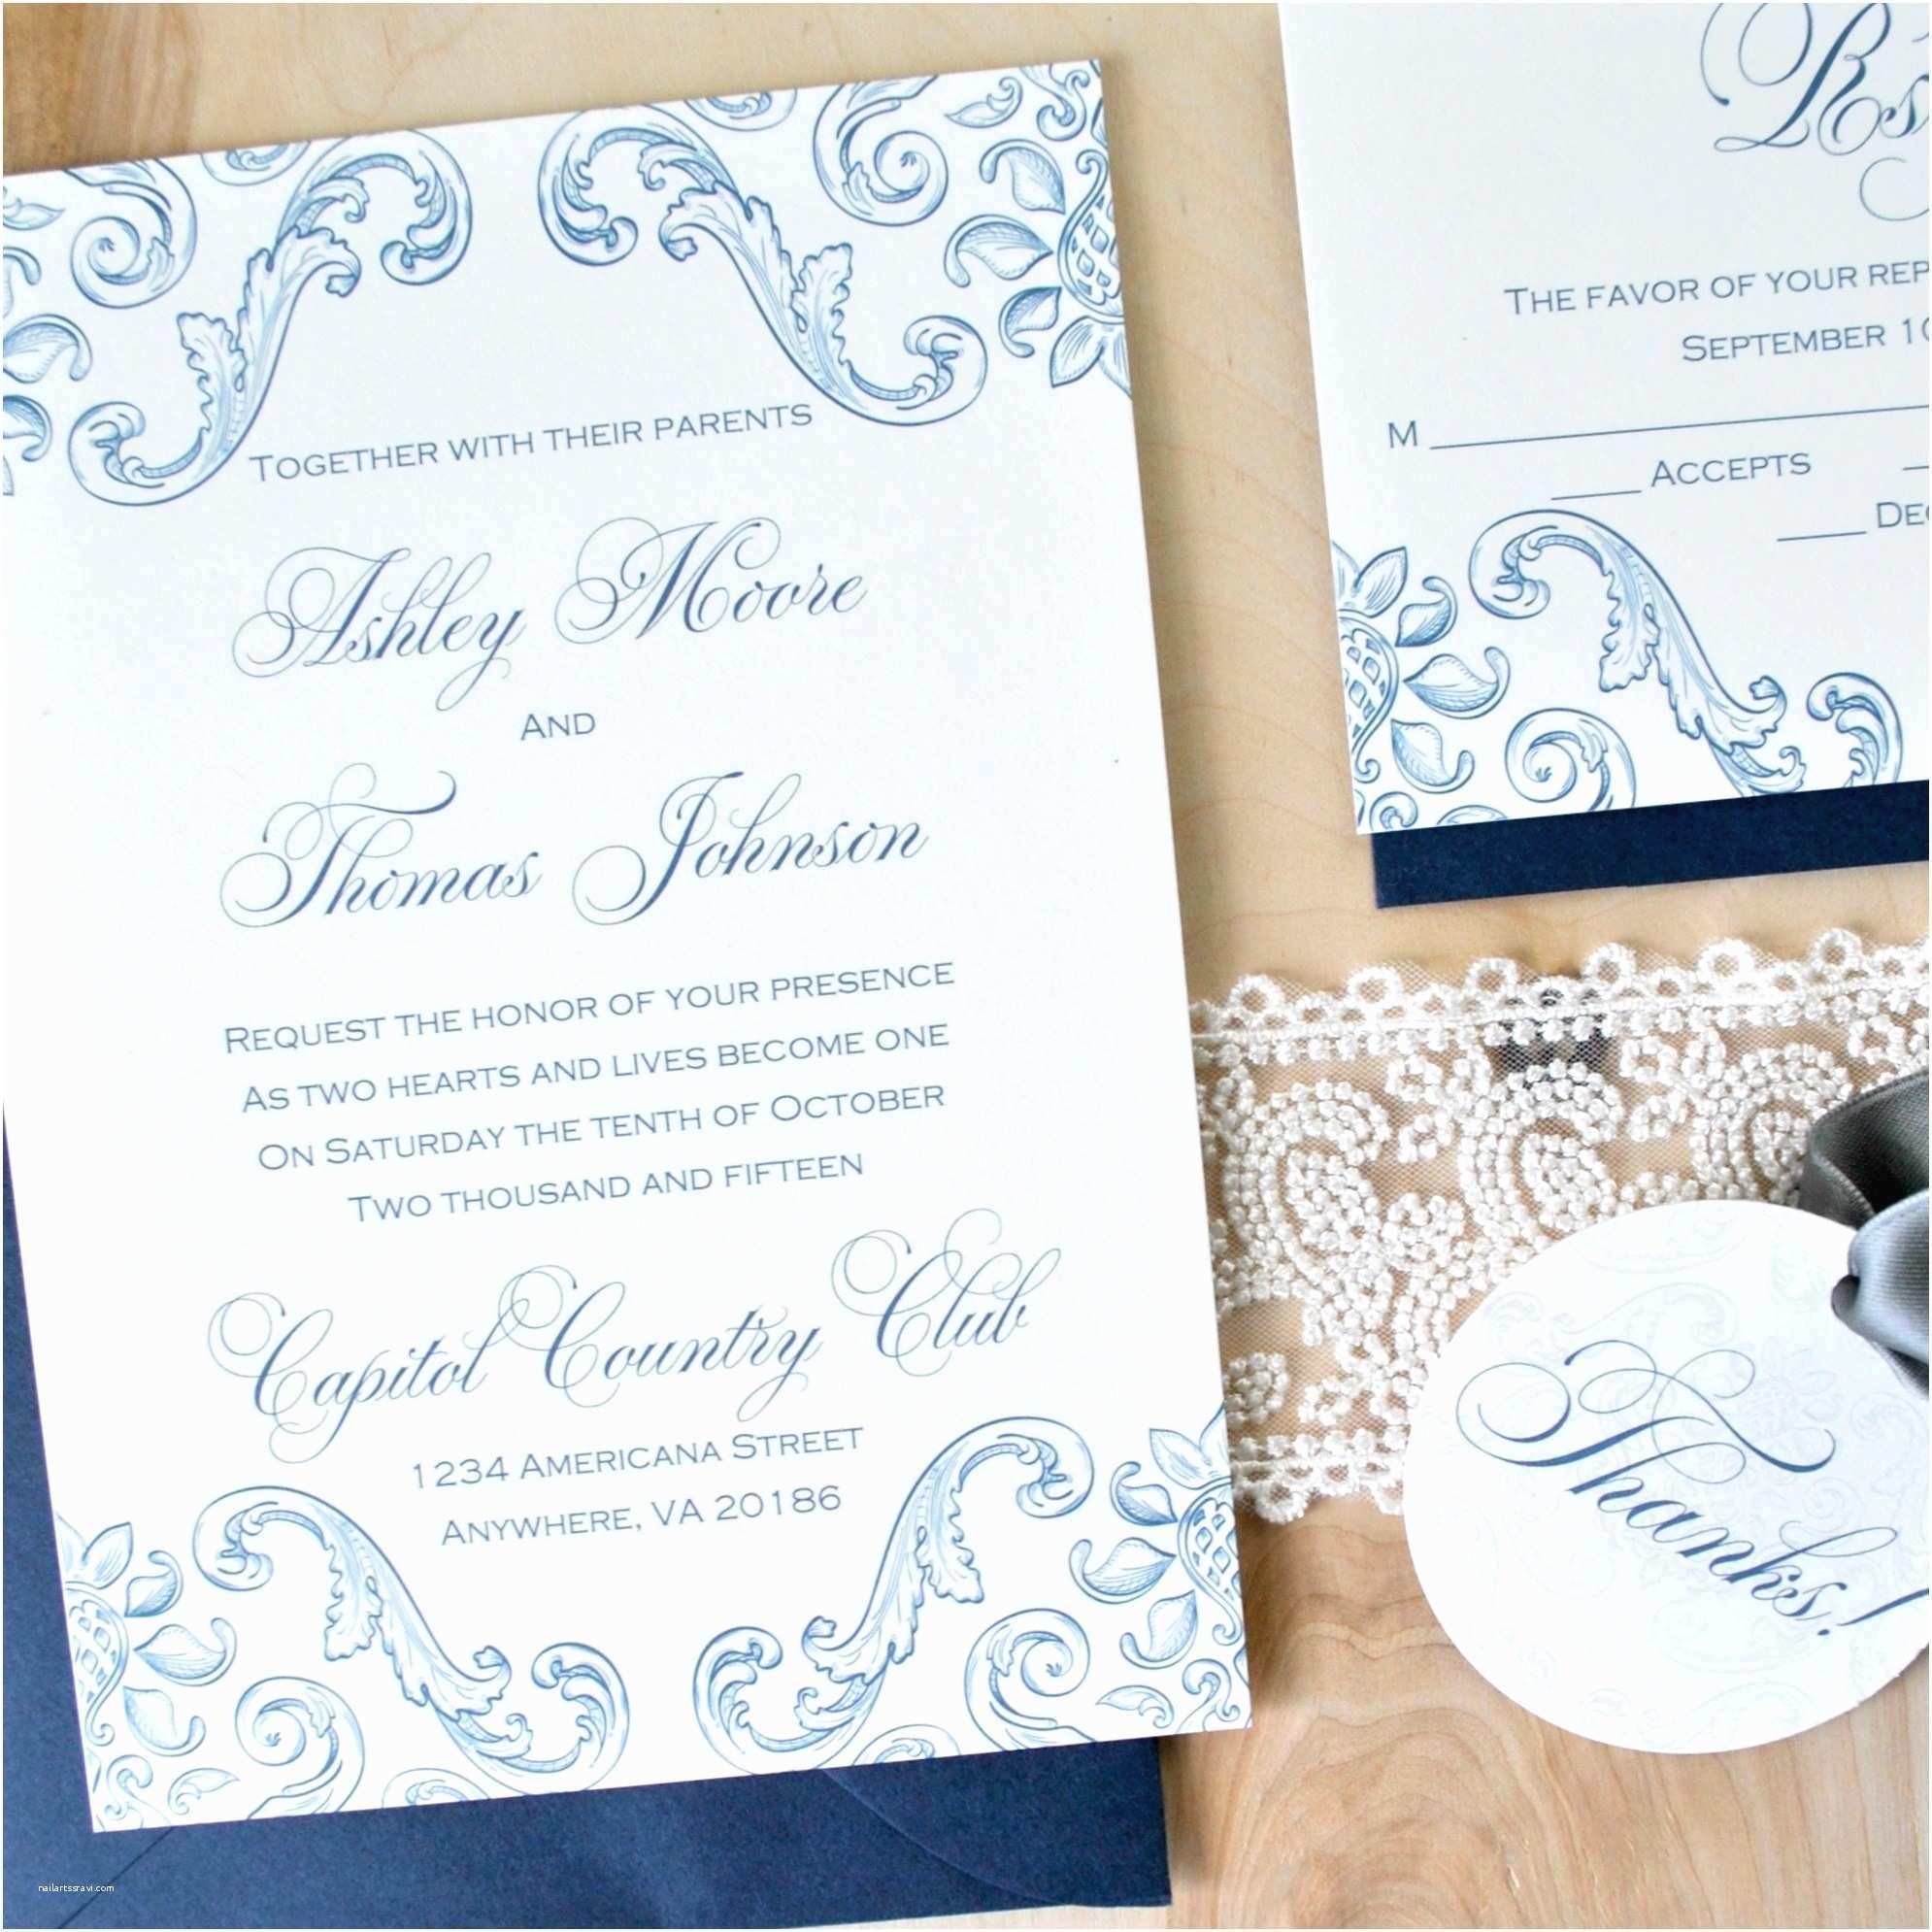 Wedding Invitations orlando Fl Blog Pretty Peacock Paperie orlando Wedding